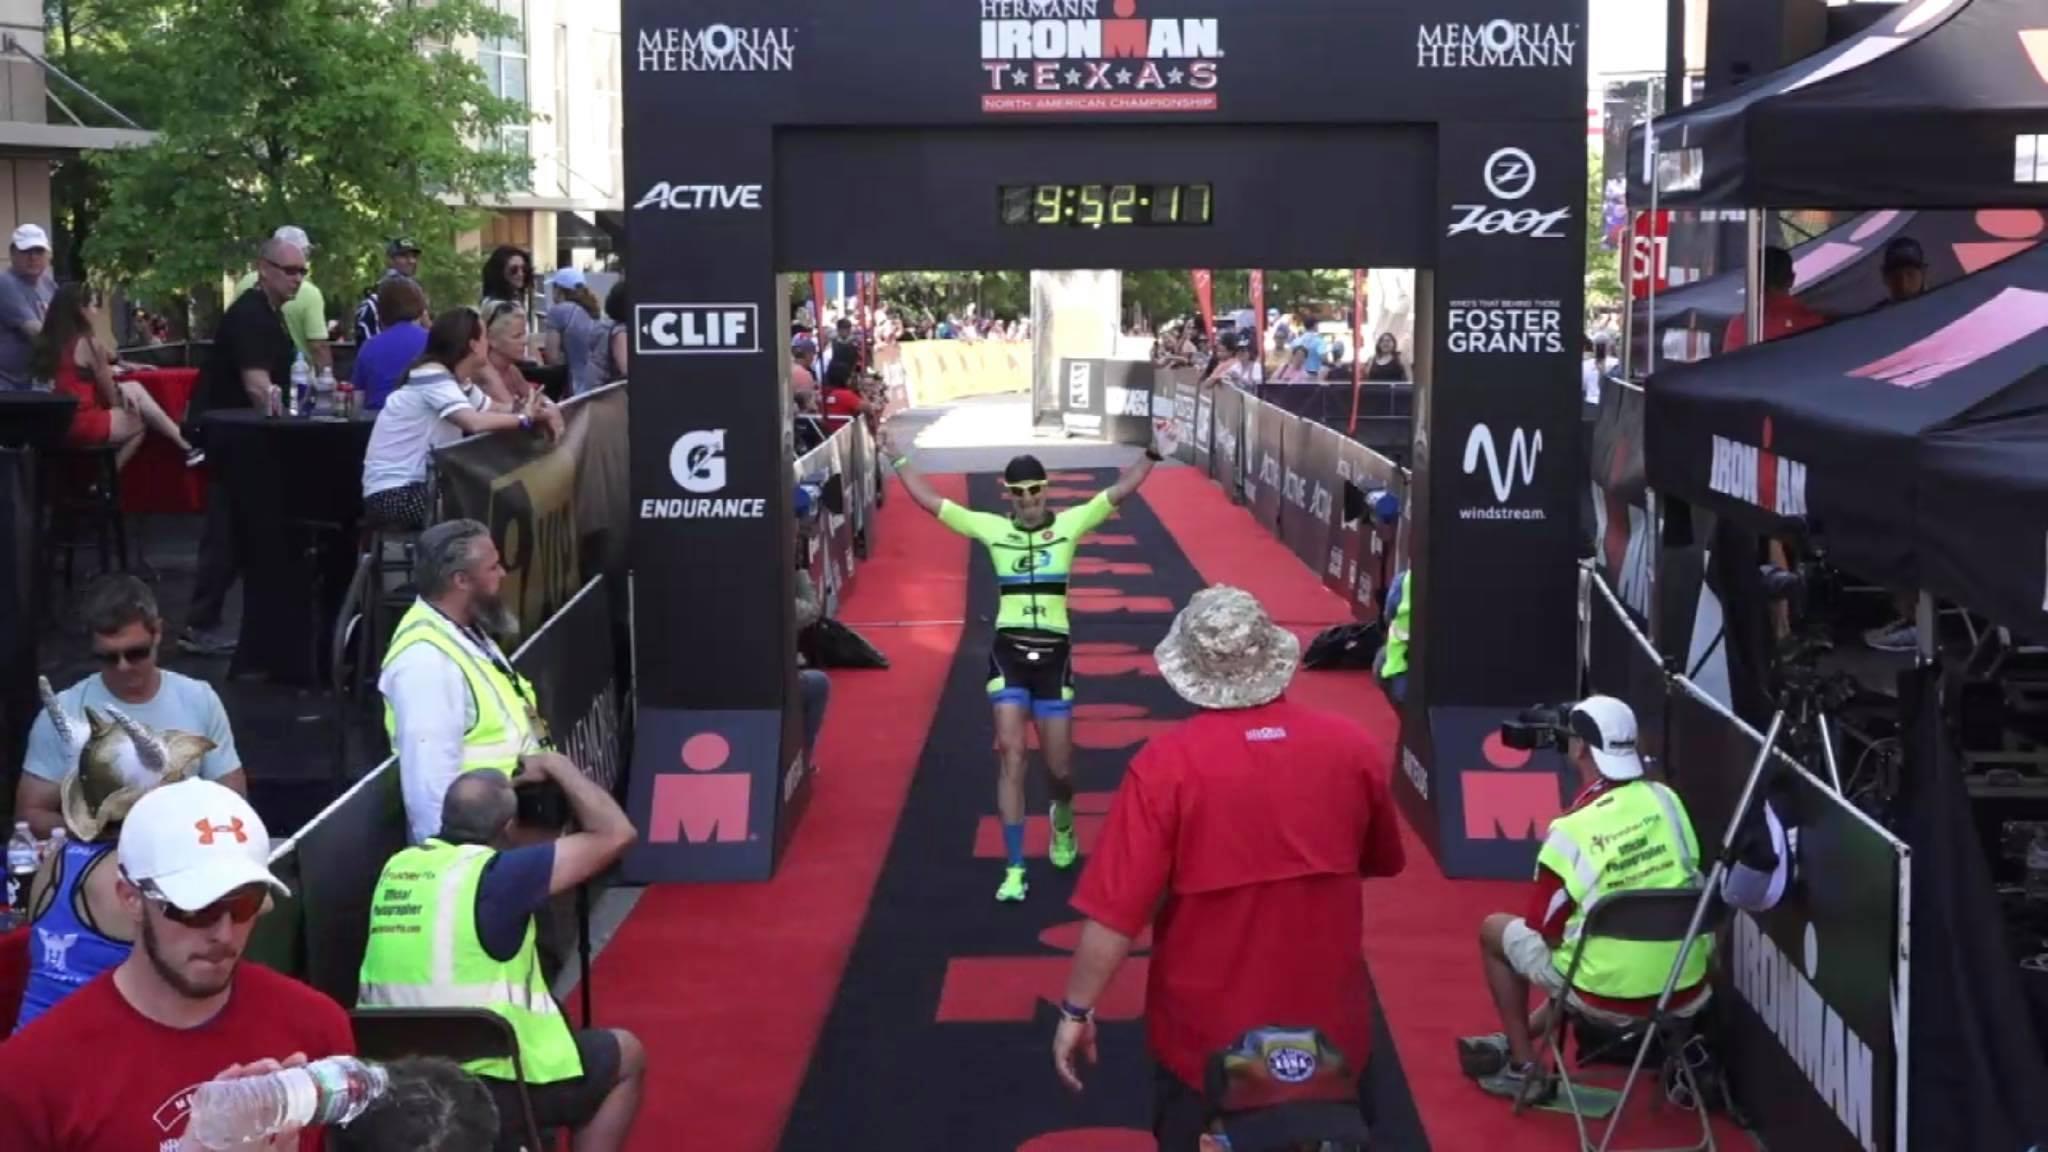 Coach_Terry_Wilson_Jana_Richtrova_Ironman_Texas_140.6_Finish_Line.jpg